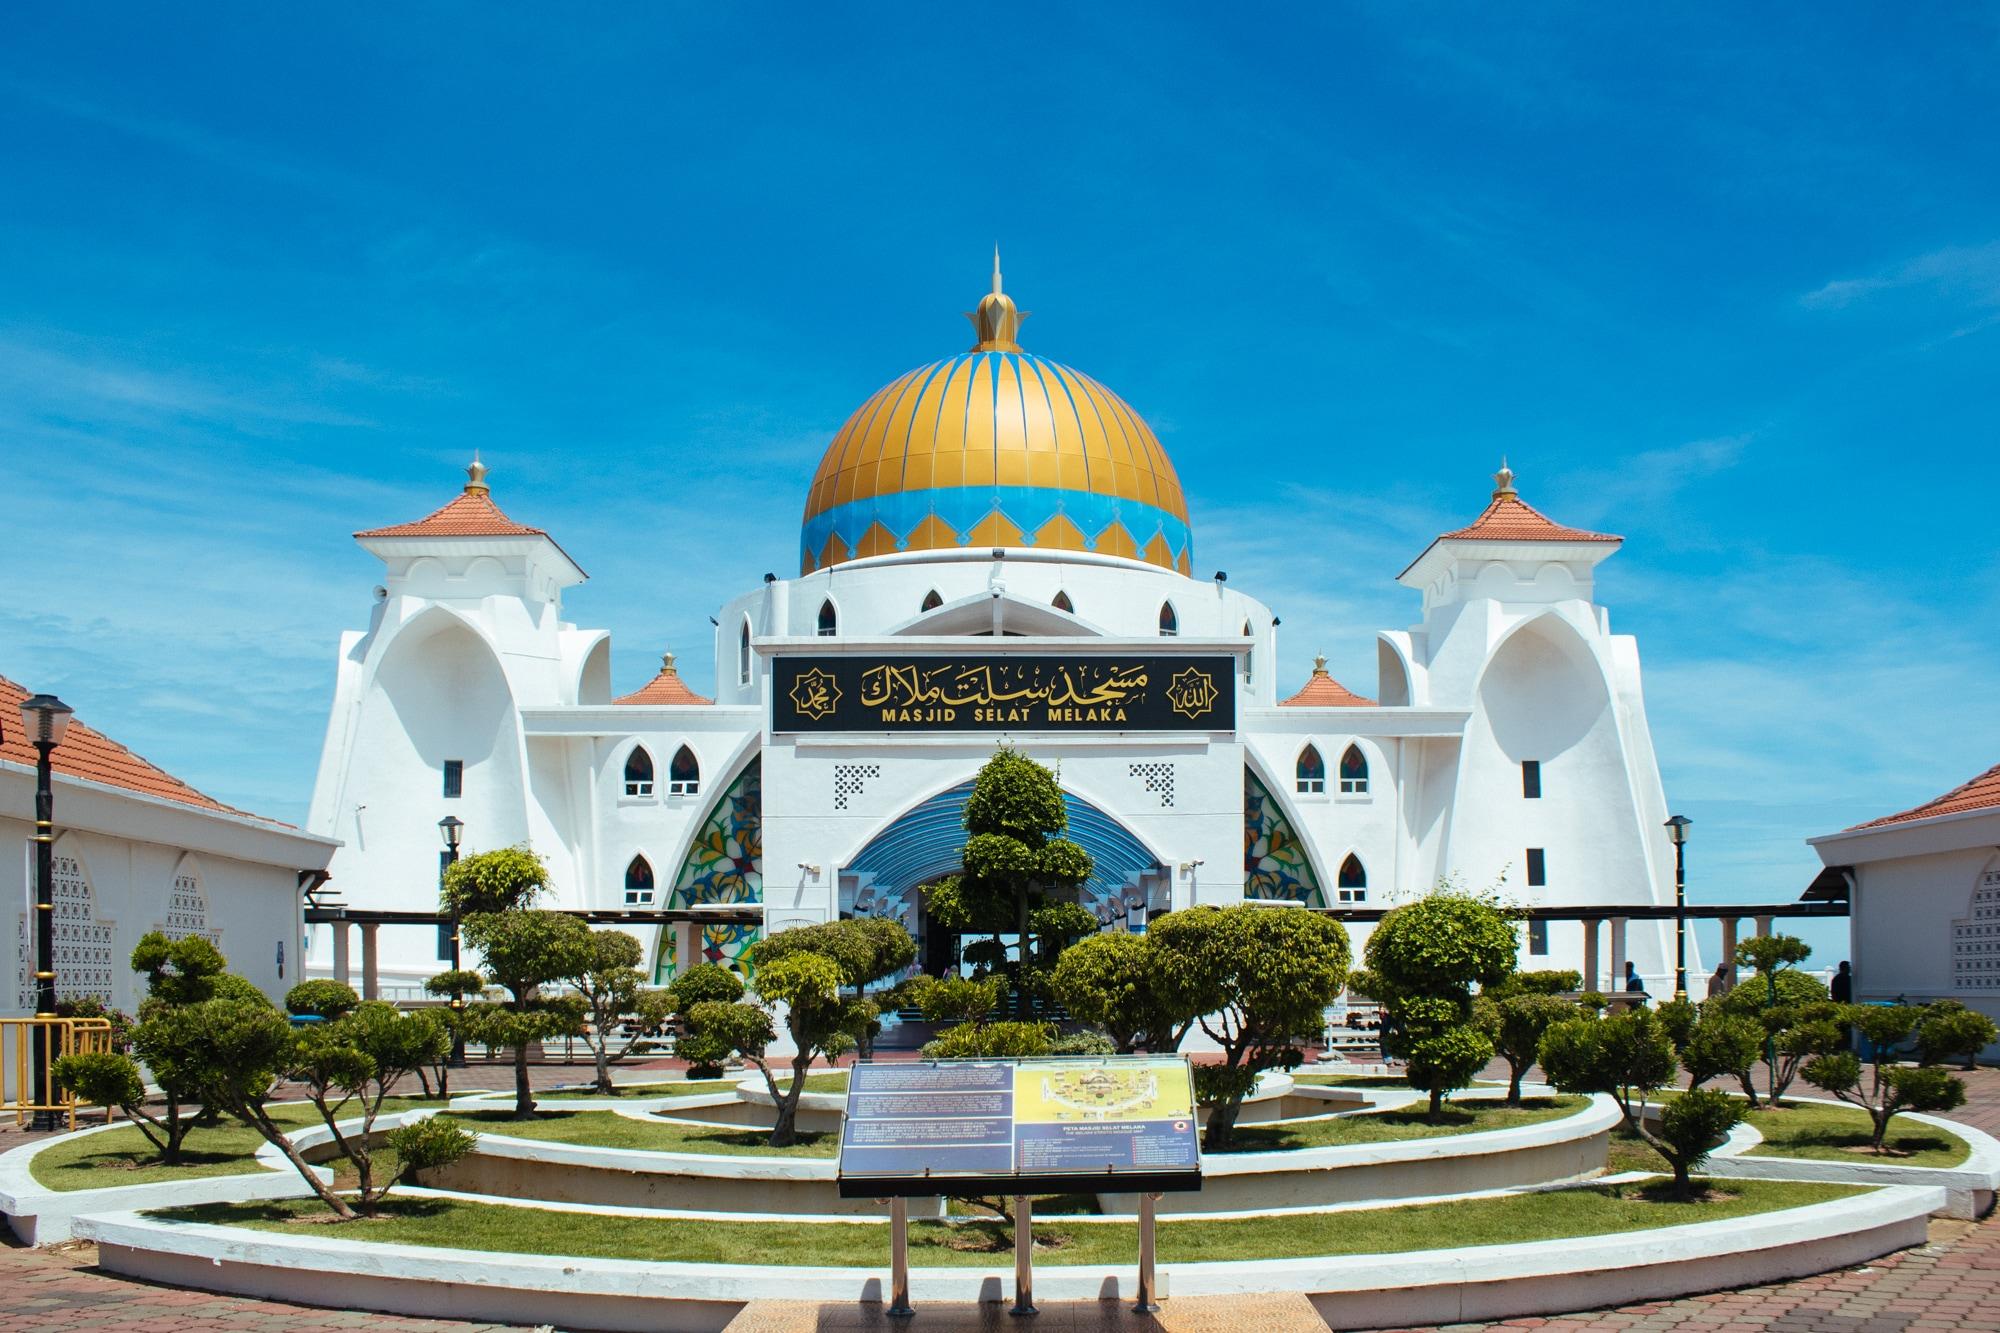 Melaka Straits Mosque aka Masjid Selat